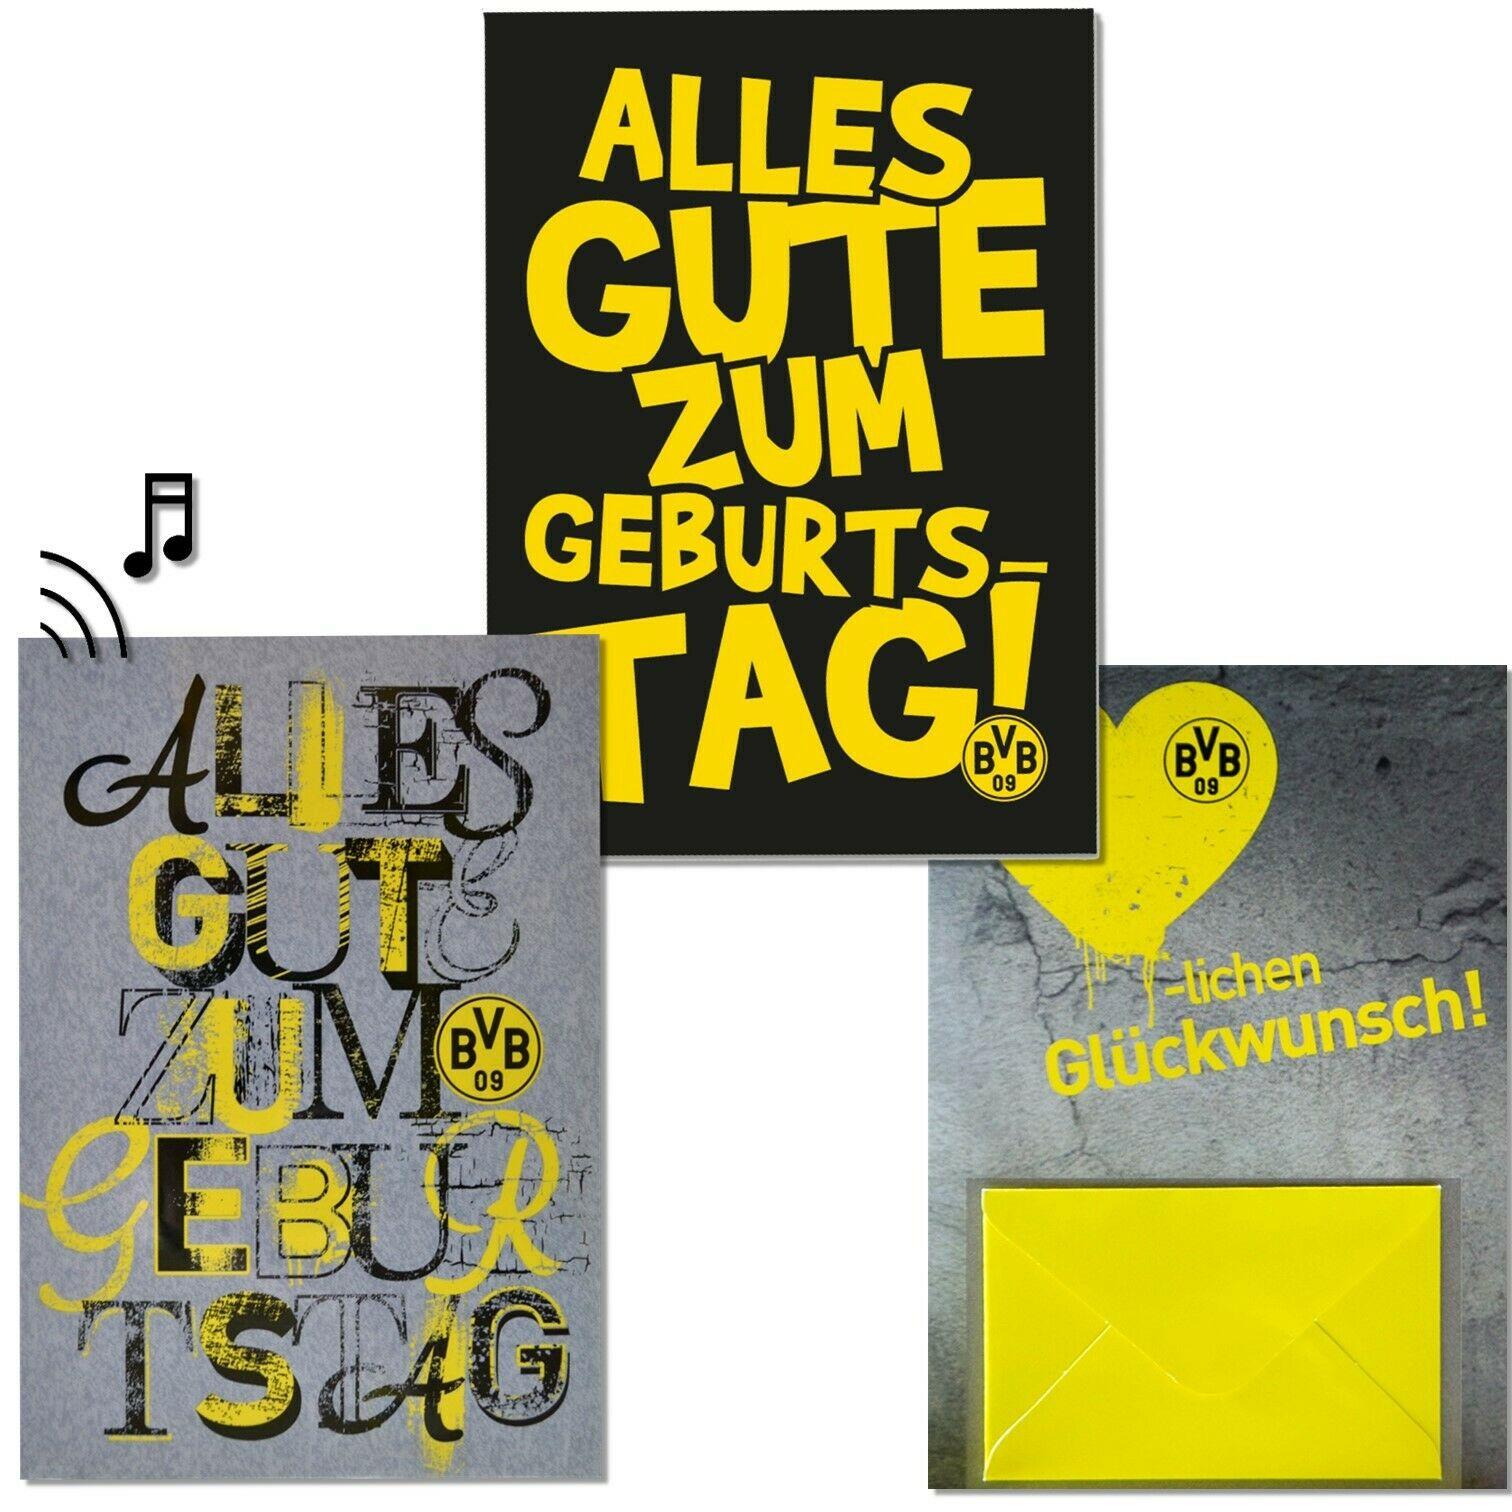 Glückwunschkarte Bvb Borussia Dortmund Geburtstagskarte verwandt mit Bvb Geburtstagskarte